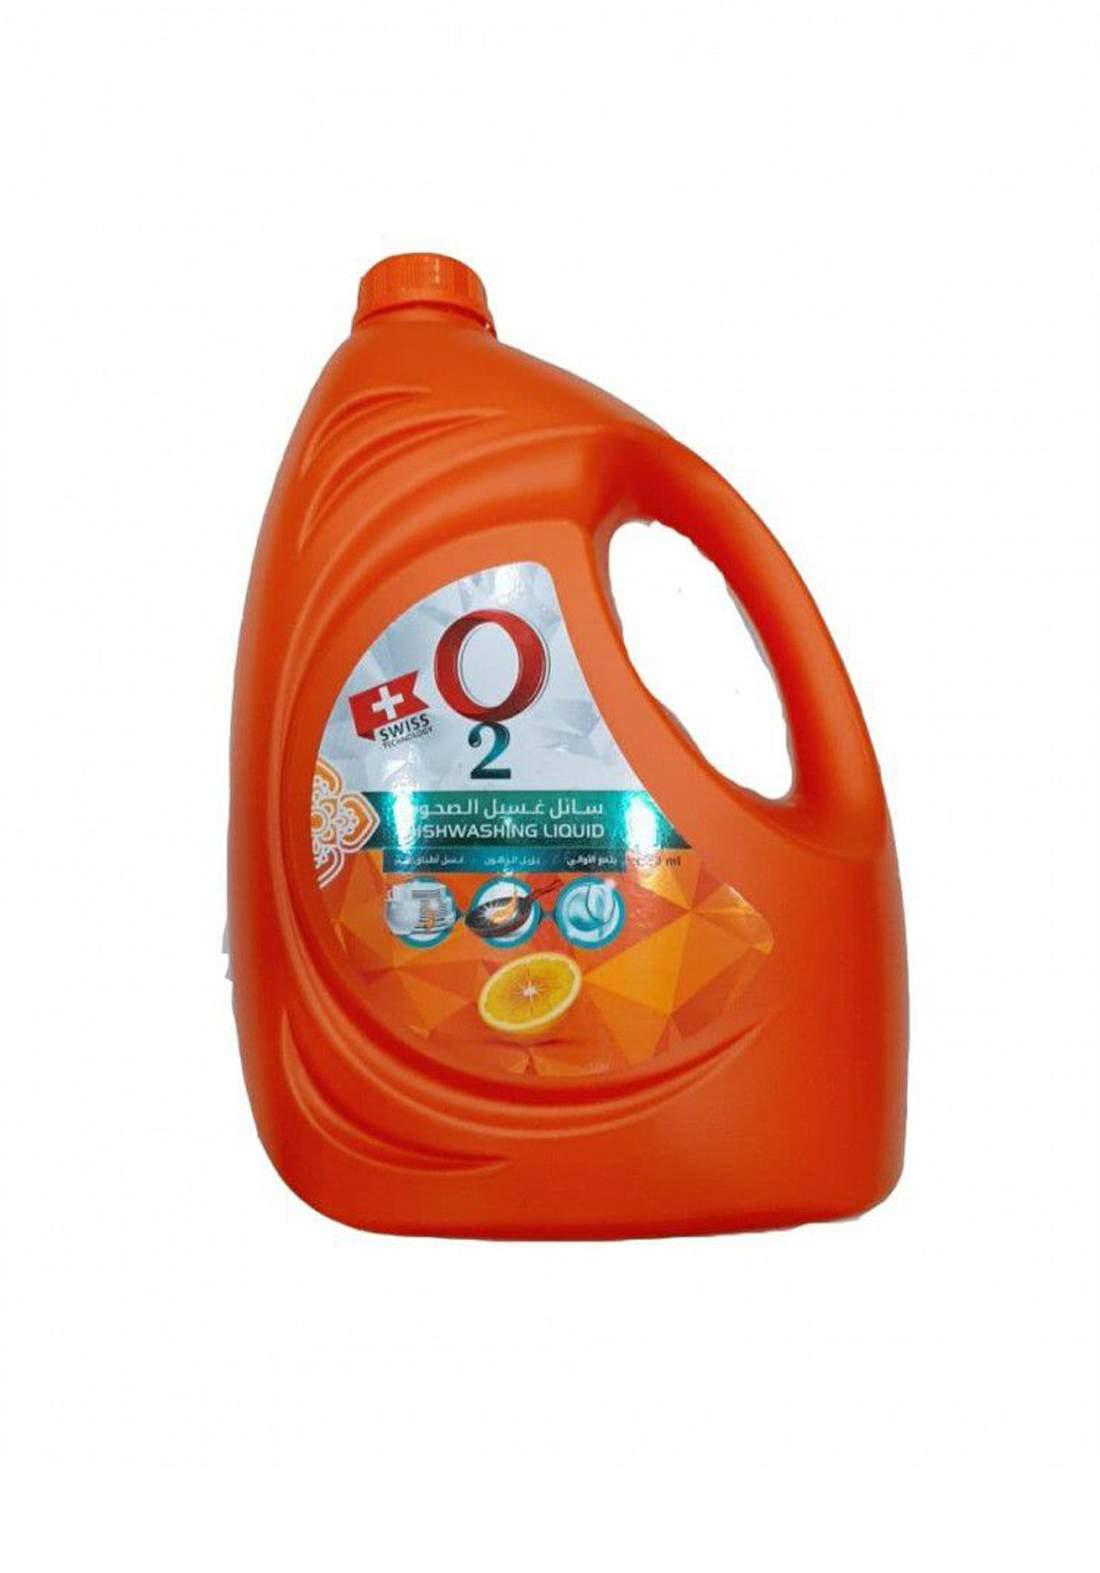 O2 Dishwashing Liquid 3750 ml سائل غسيل الصحون برائحة البرتقال